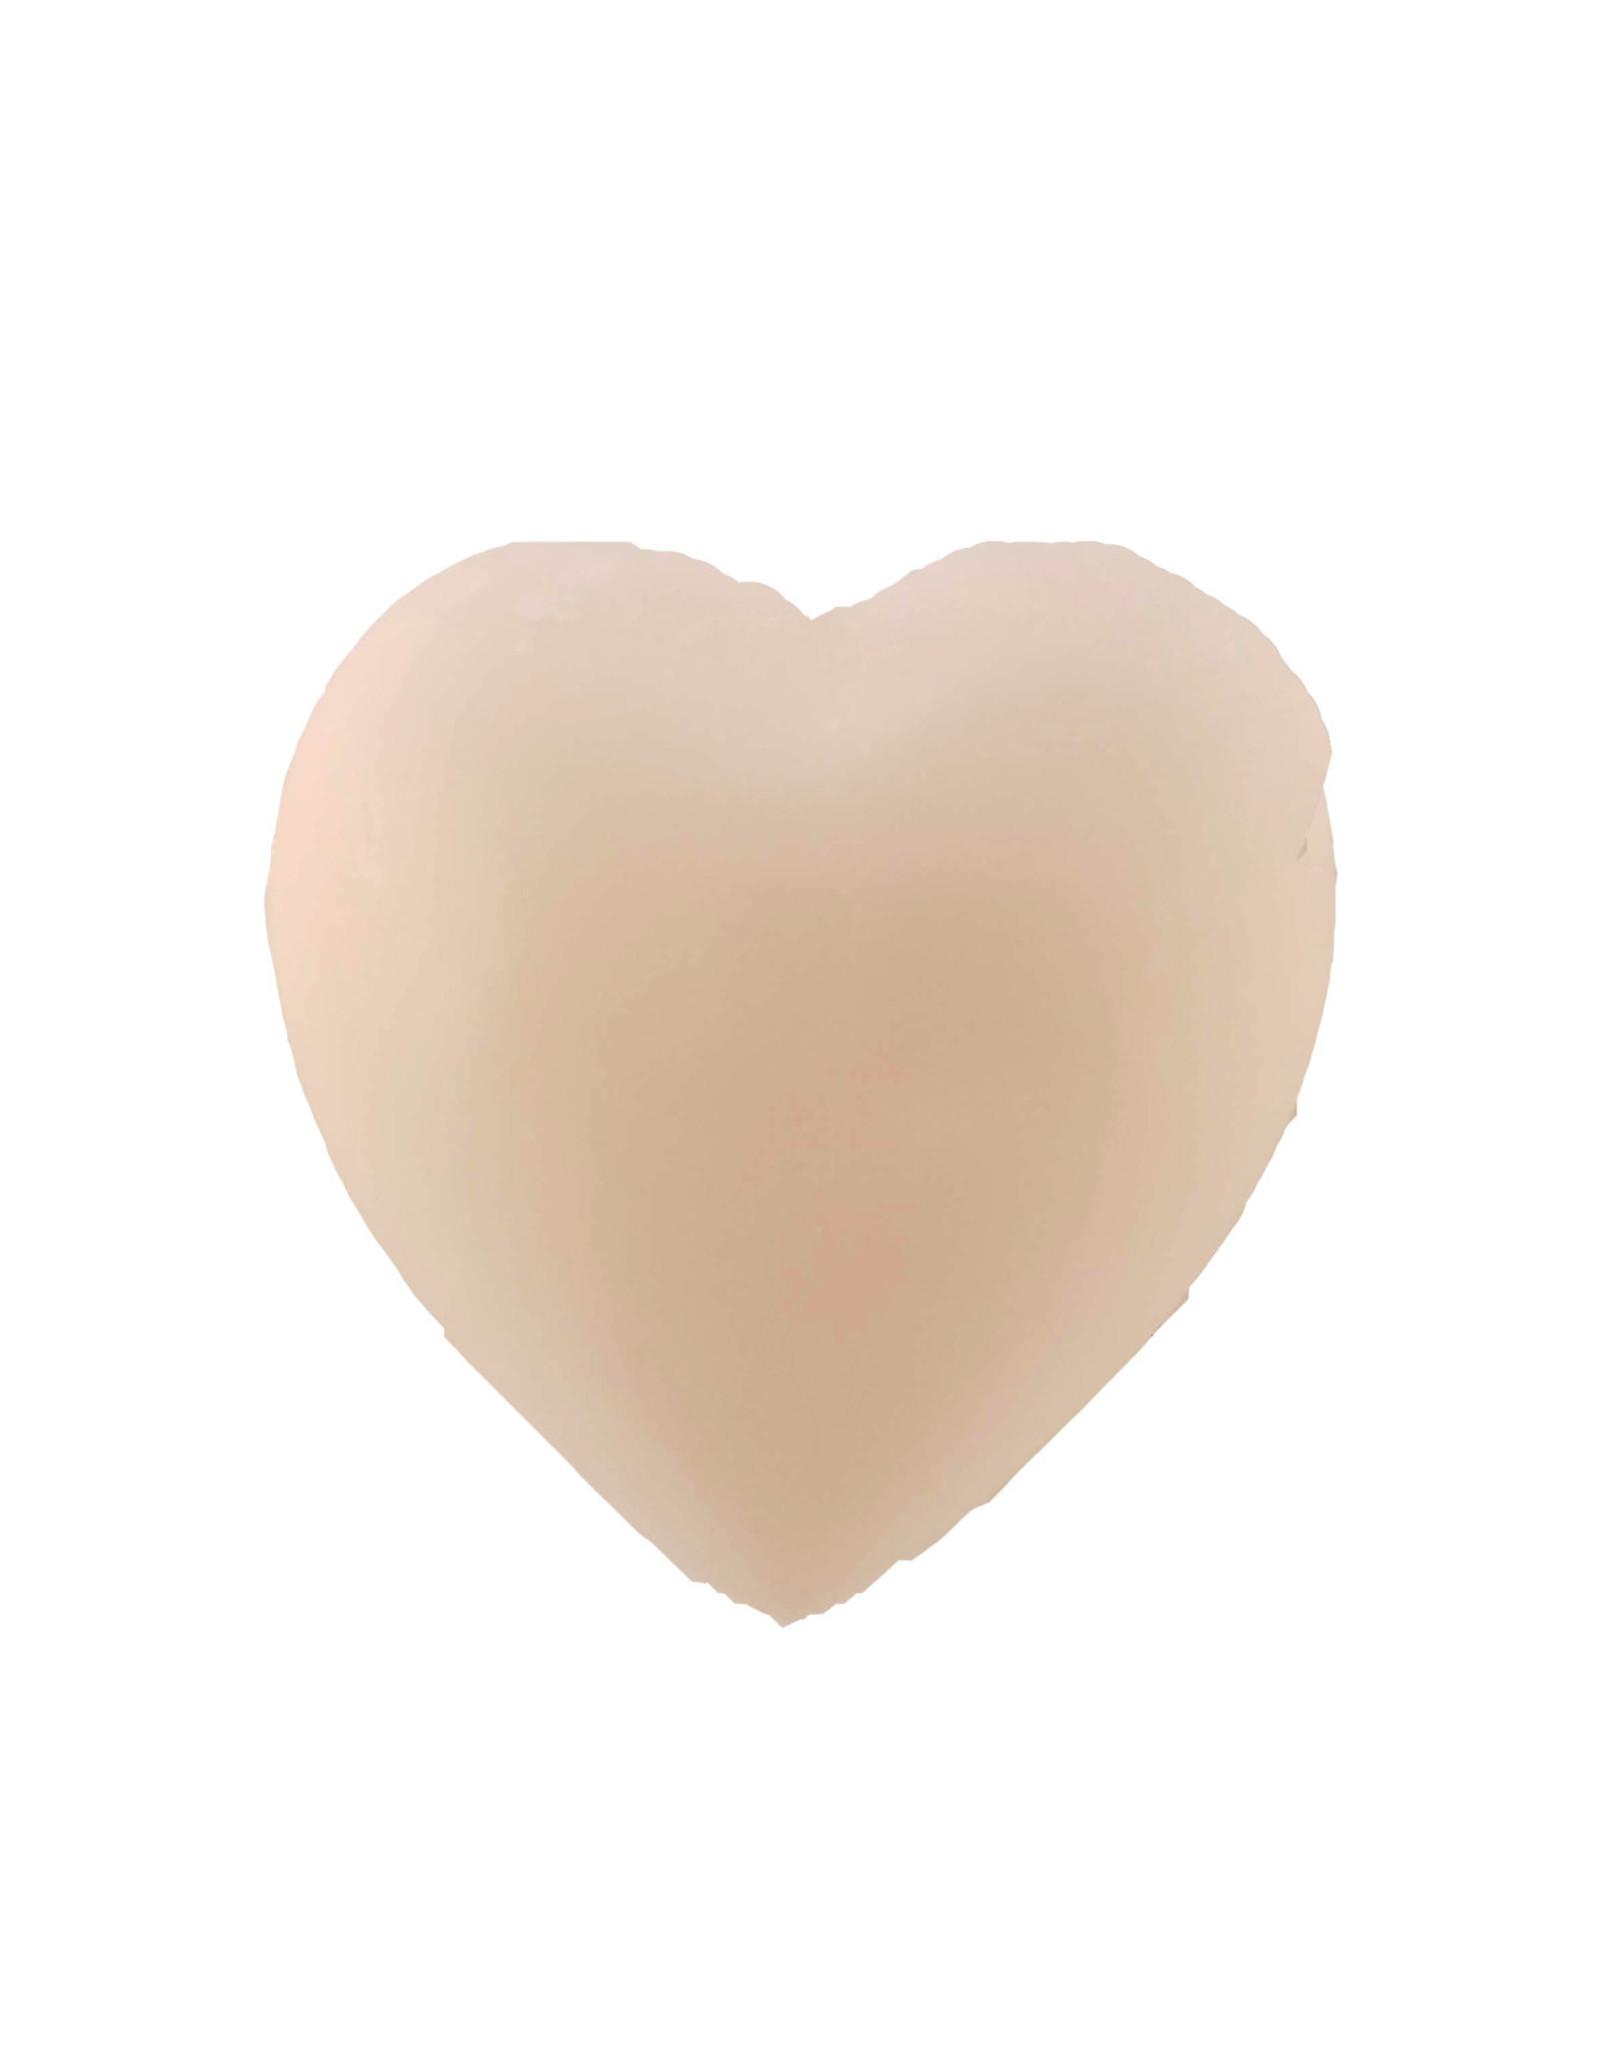 Milk 100g Heart Soap